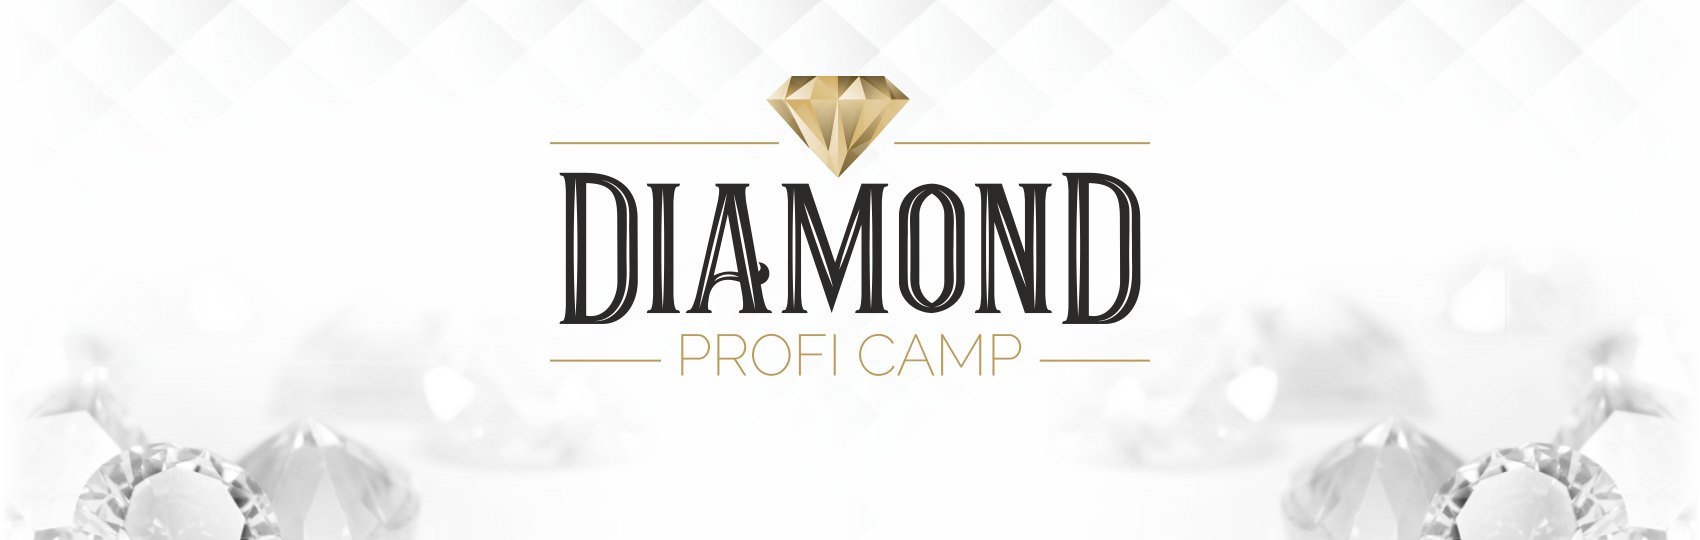 Diamond Profi Camp